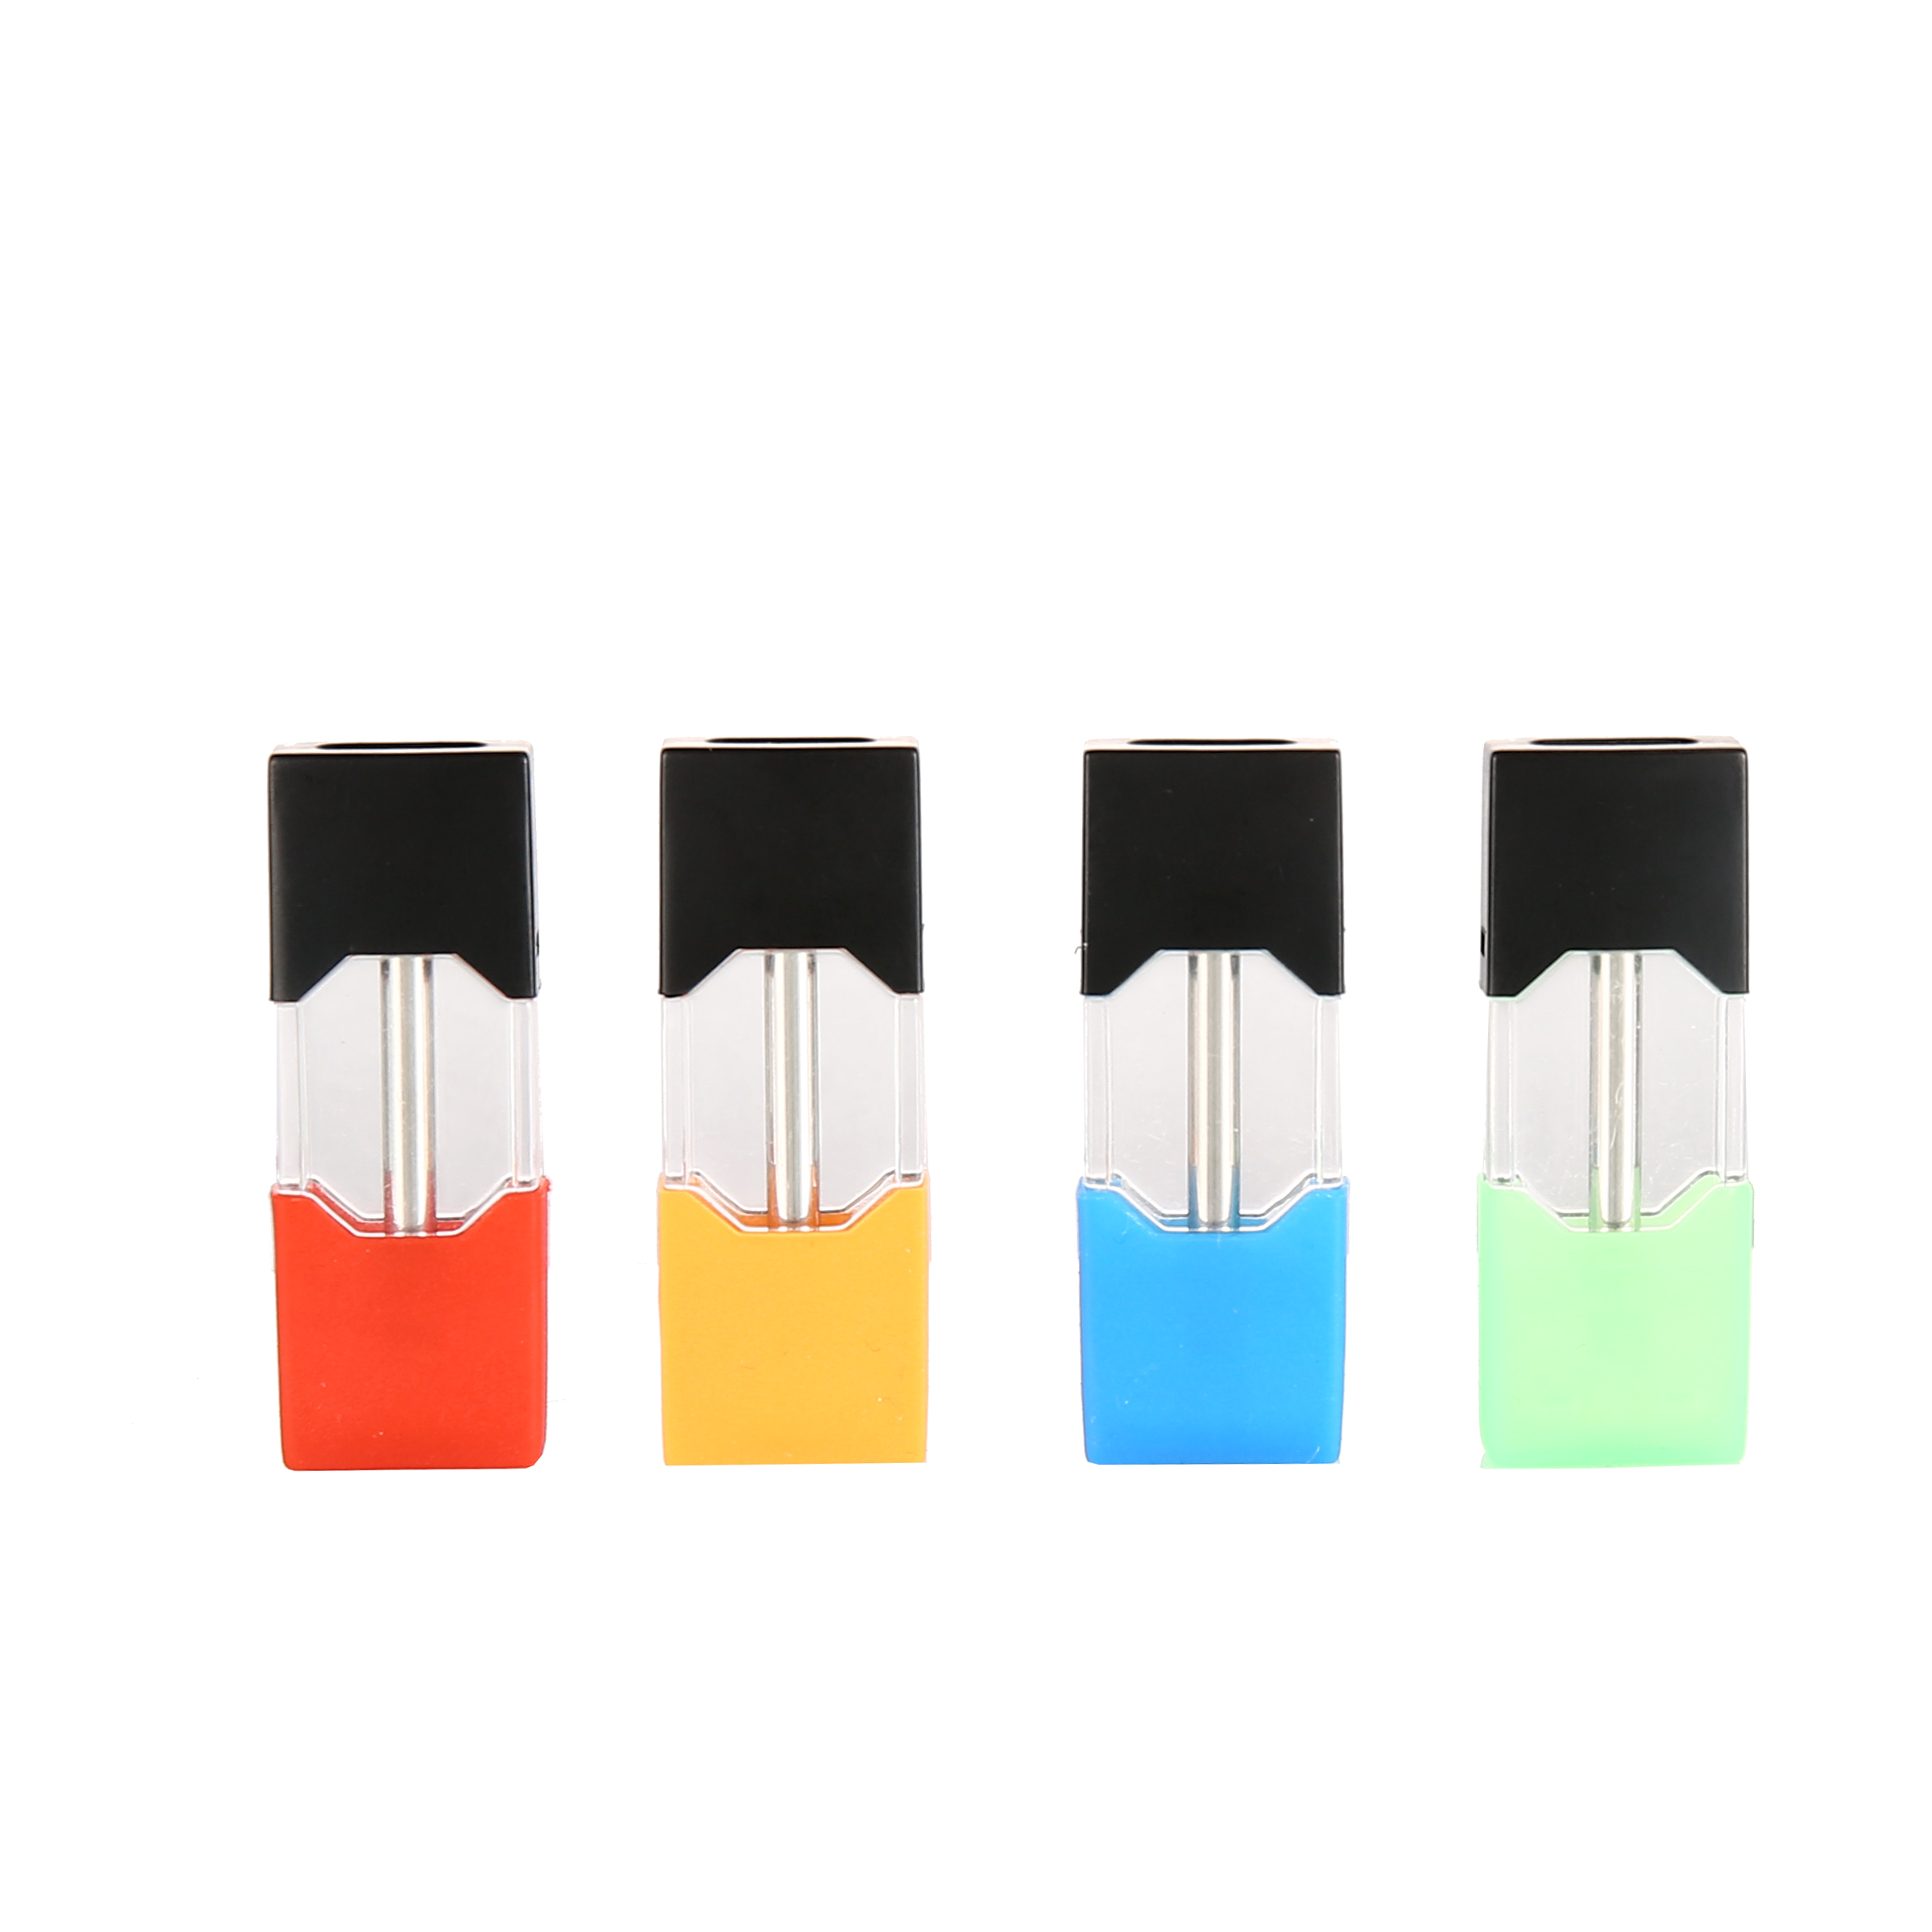 POD Cartridge Coil Atomizer Pods  For JUUL Vape Mod Electronic Cigarette Kit  Ceramic Core Universal Vaporizer